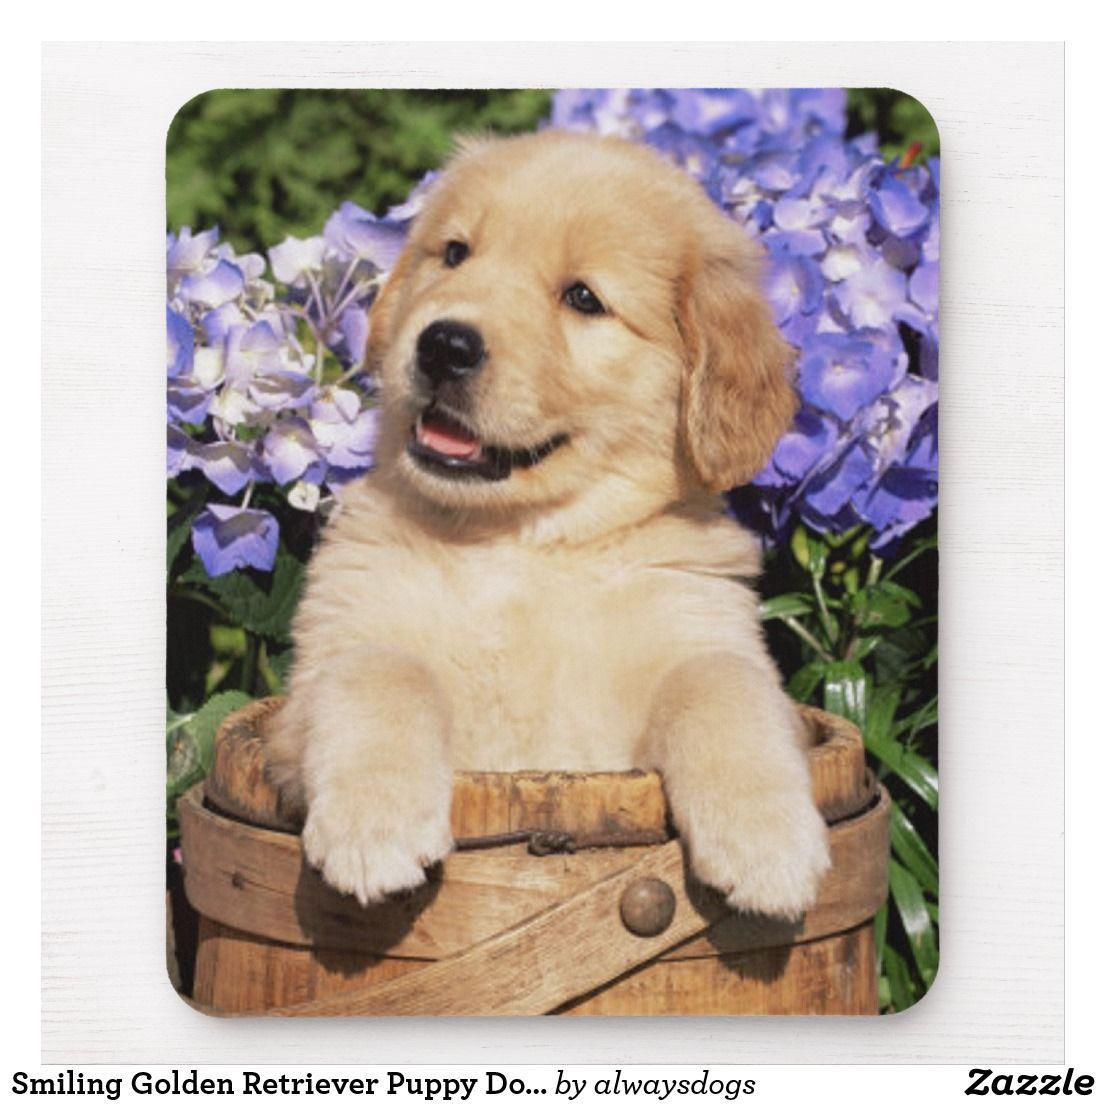 Smiling Golden Retriever Puppy Dog Mouse Pad Zazzle Com Cute